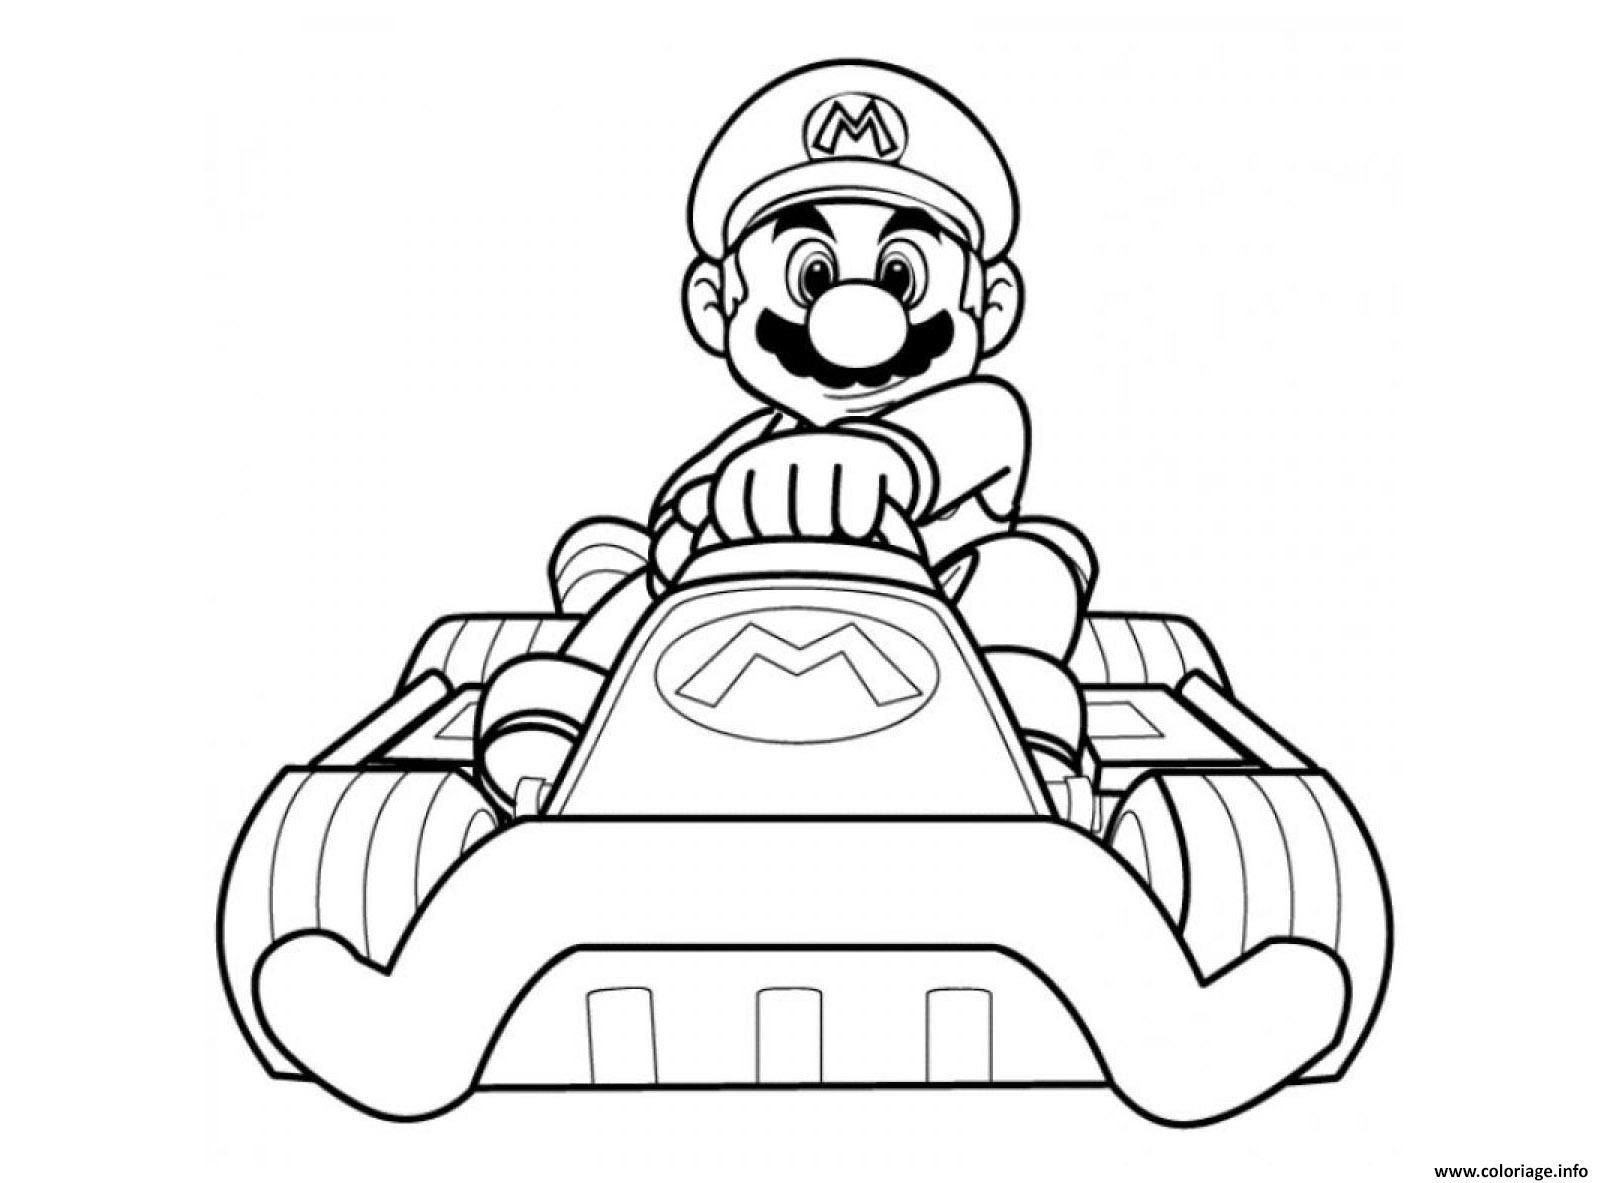 Coloriage Mario Kart Wii Avec Sa Voiture Dessin  Imprimer